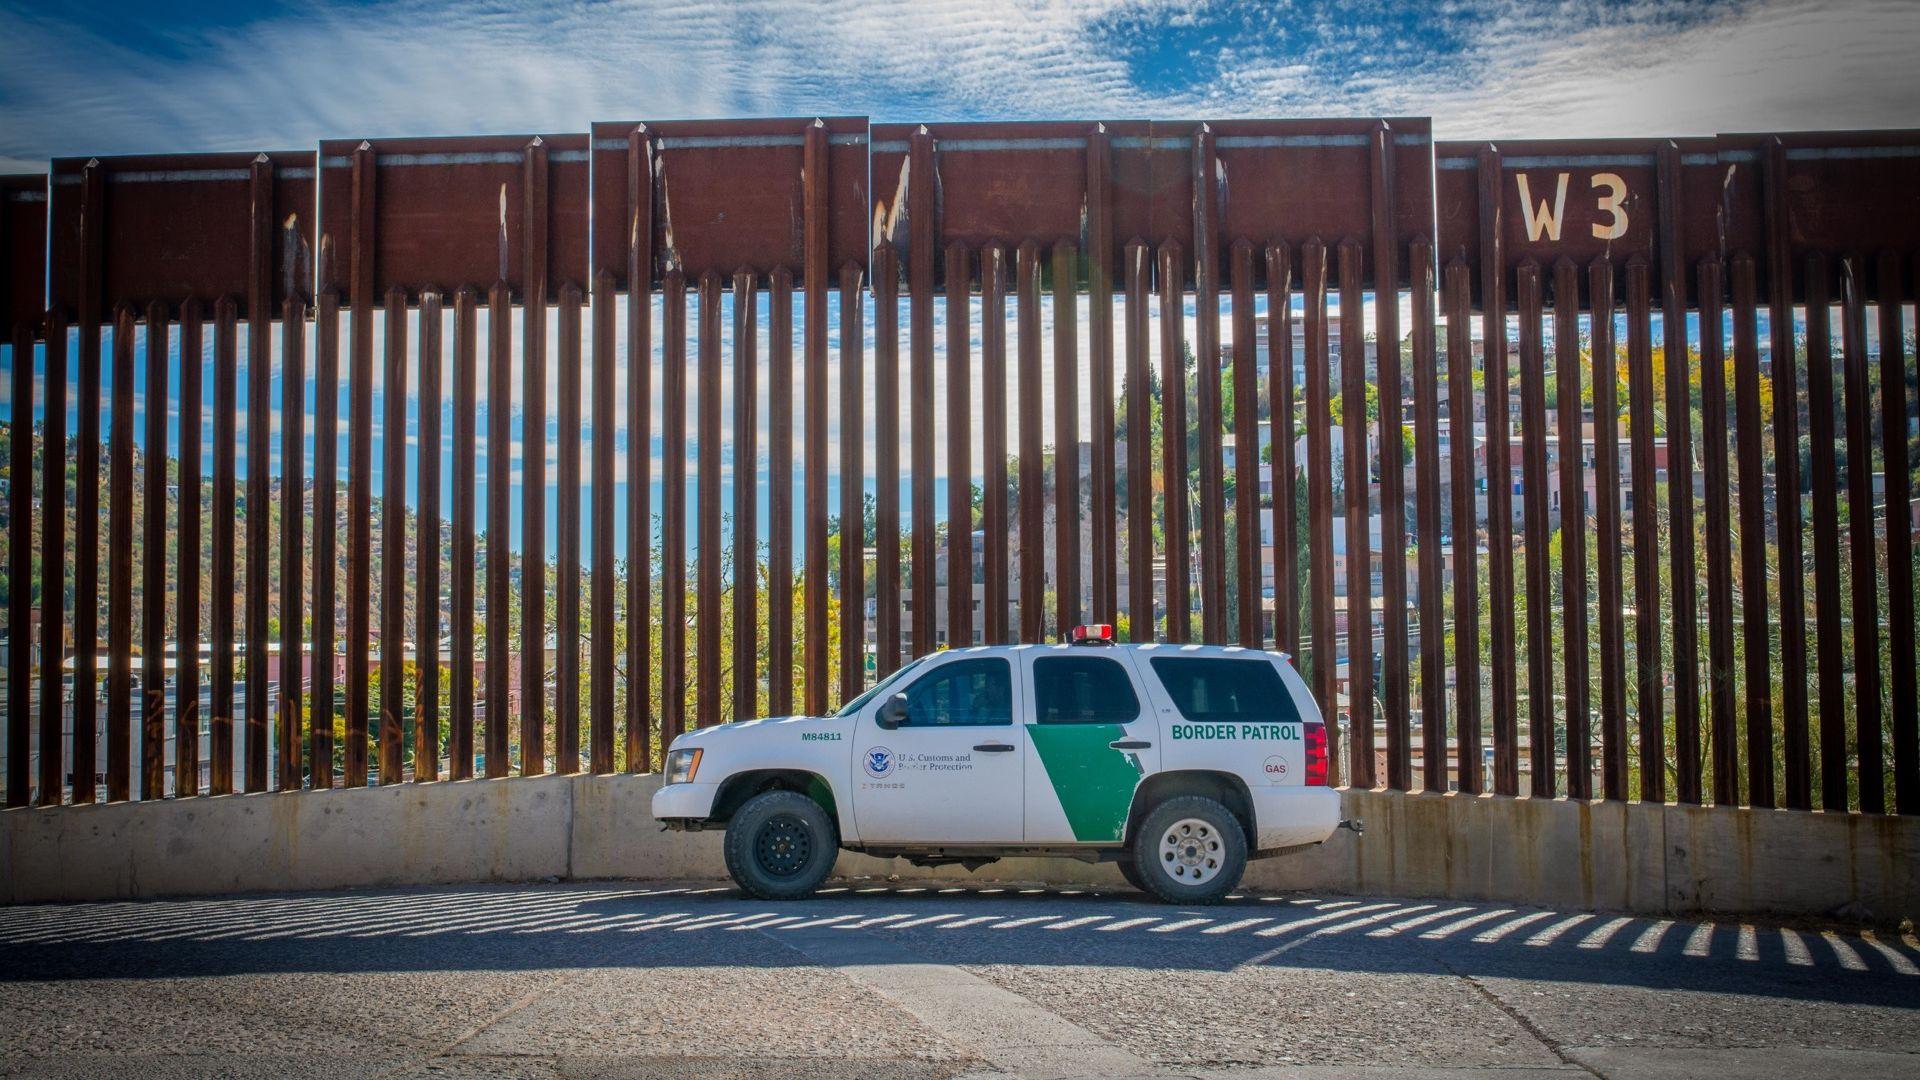 The border wall in Nogales, Arizona